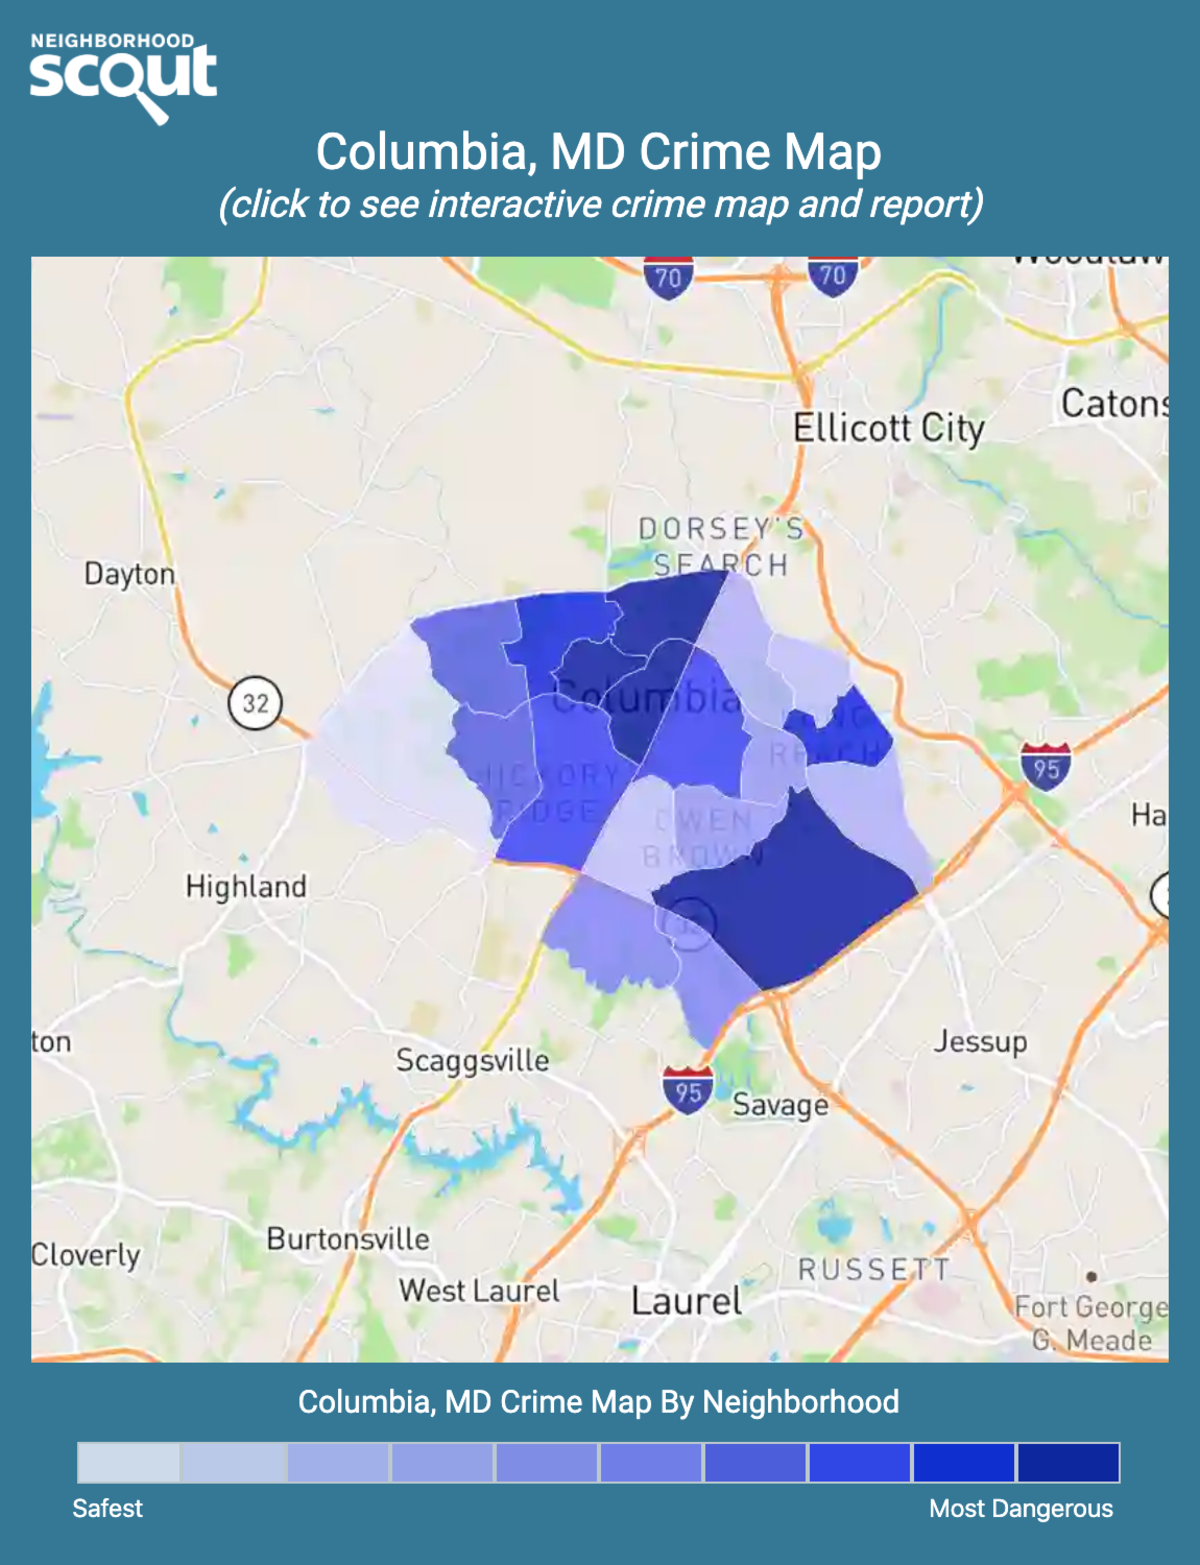 Columbia, Maryland crime map